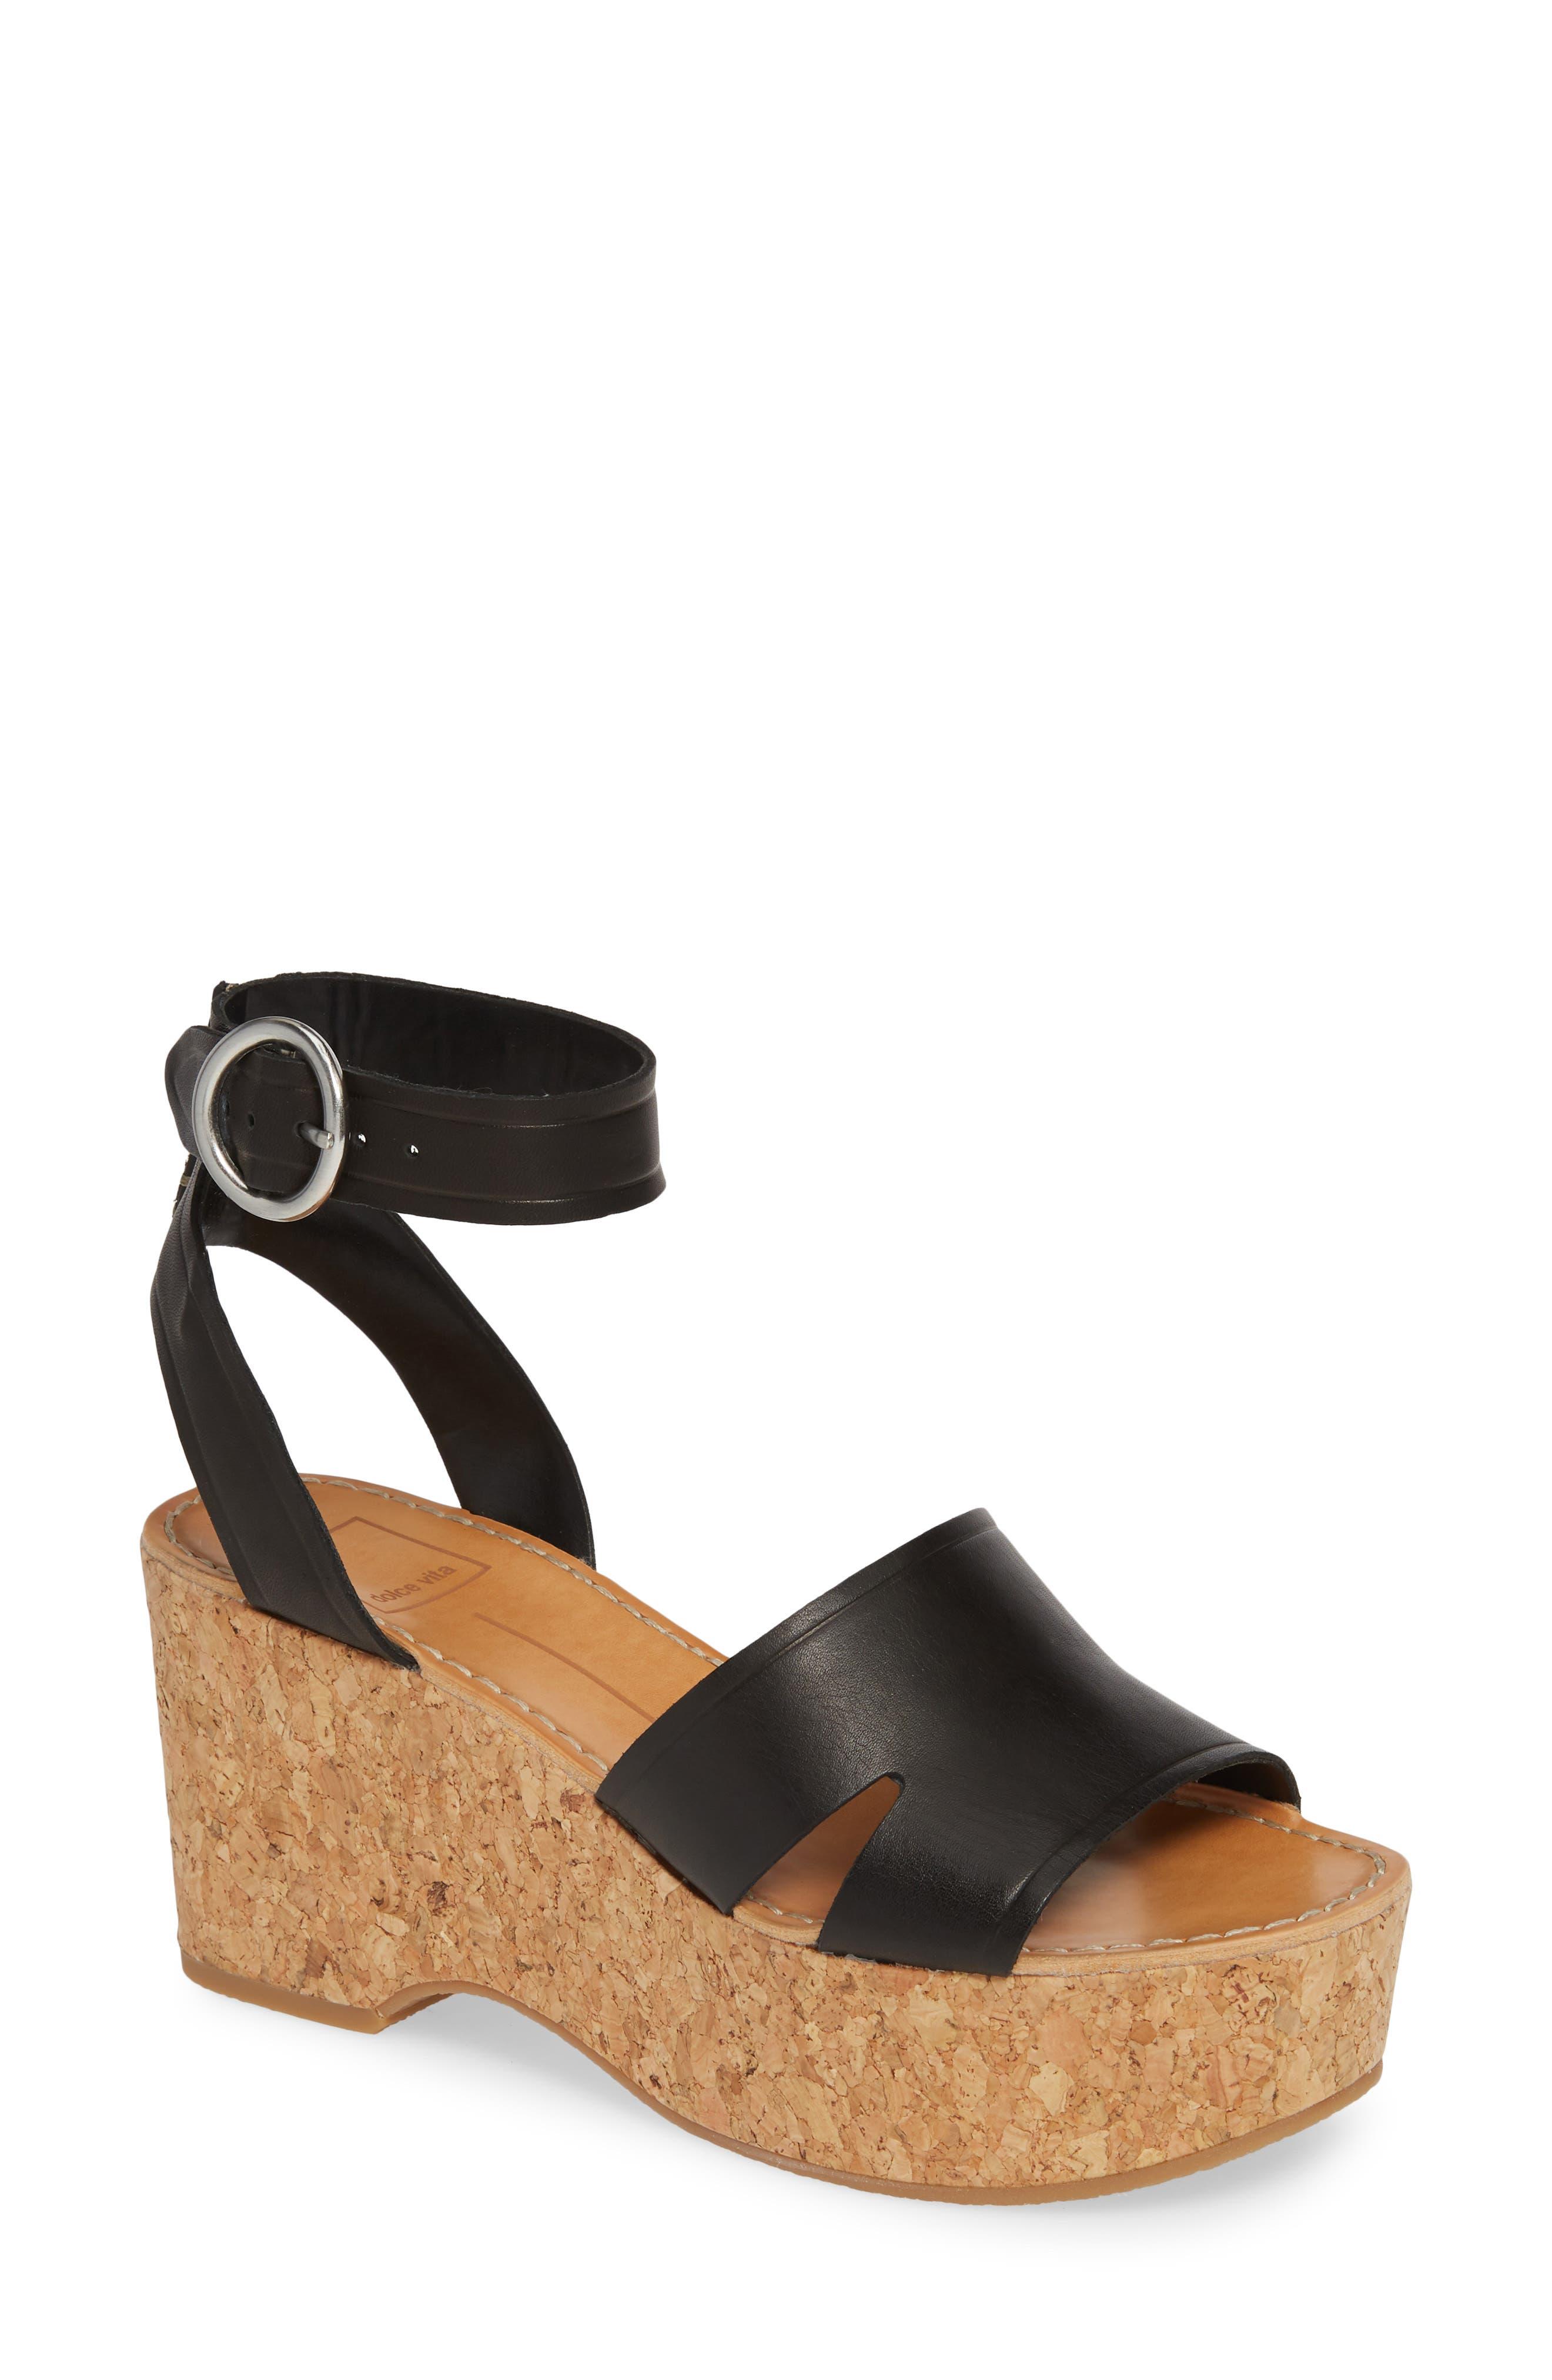 DOLCE VITA, Linda Cork Platform Sandal, Main thumbnail 1, color, 001